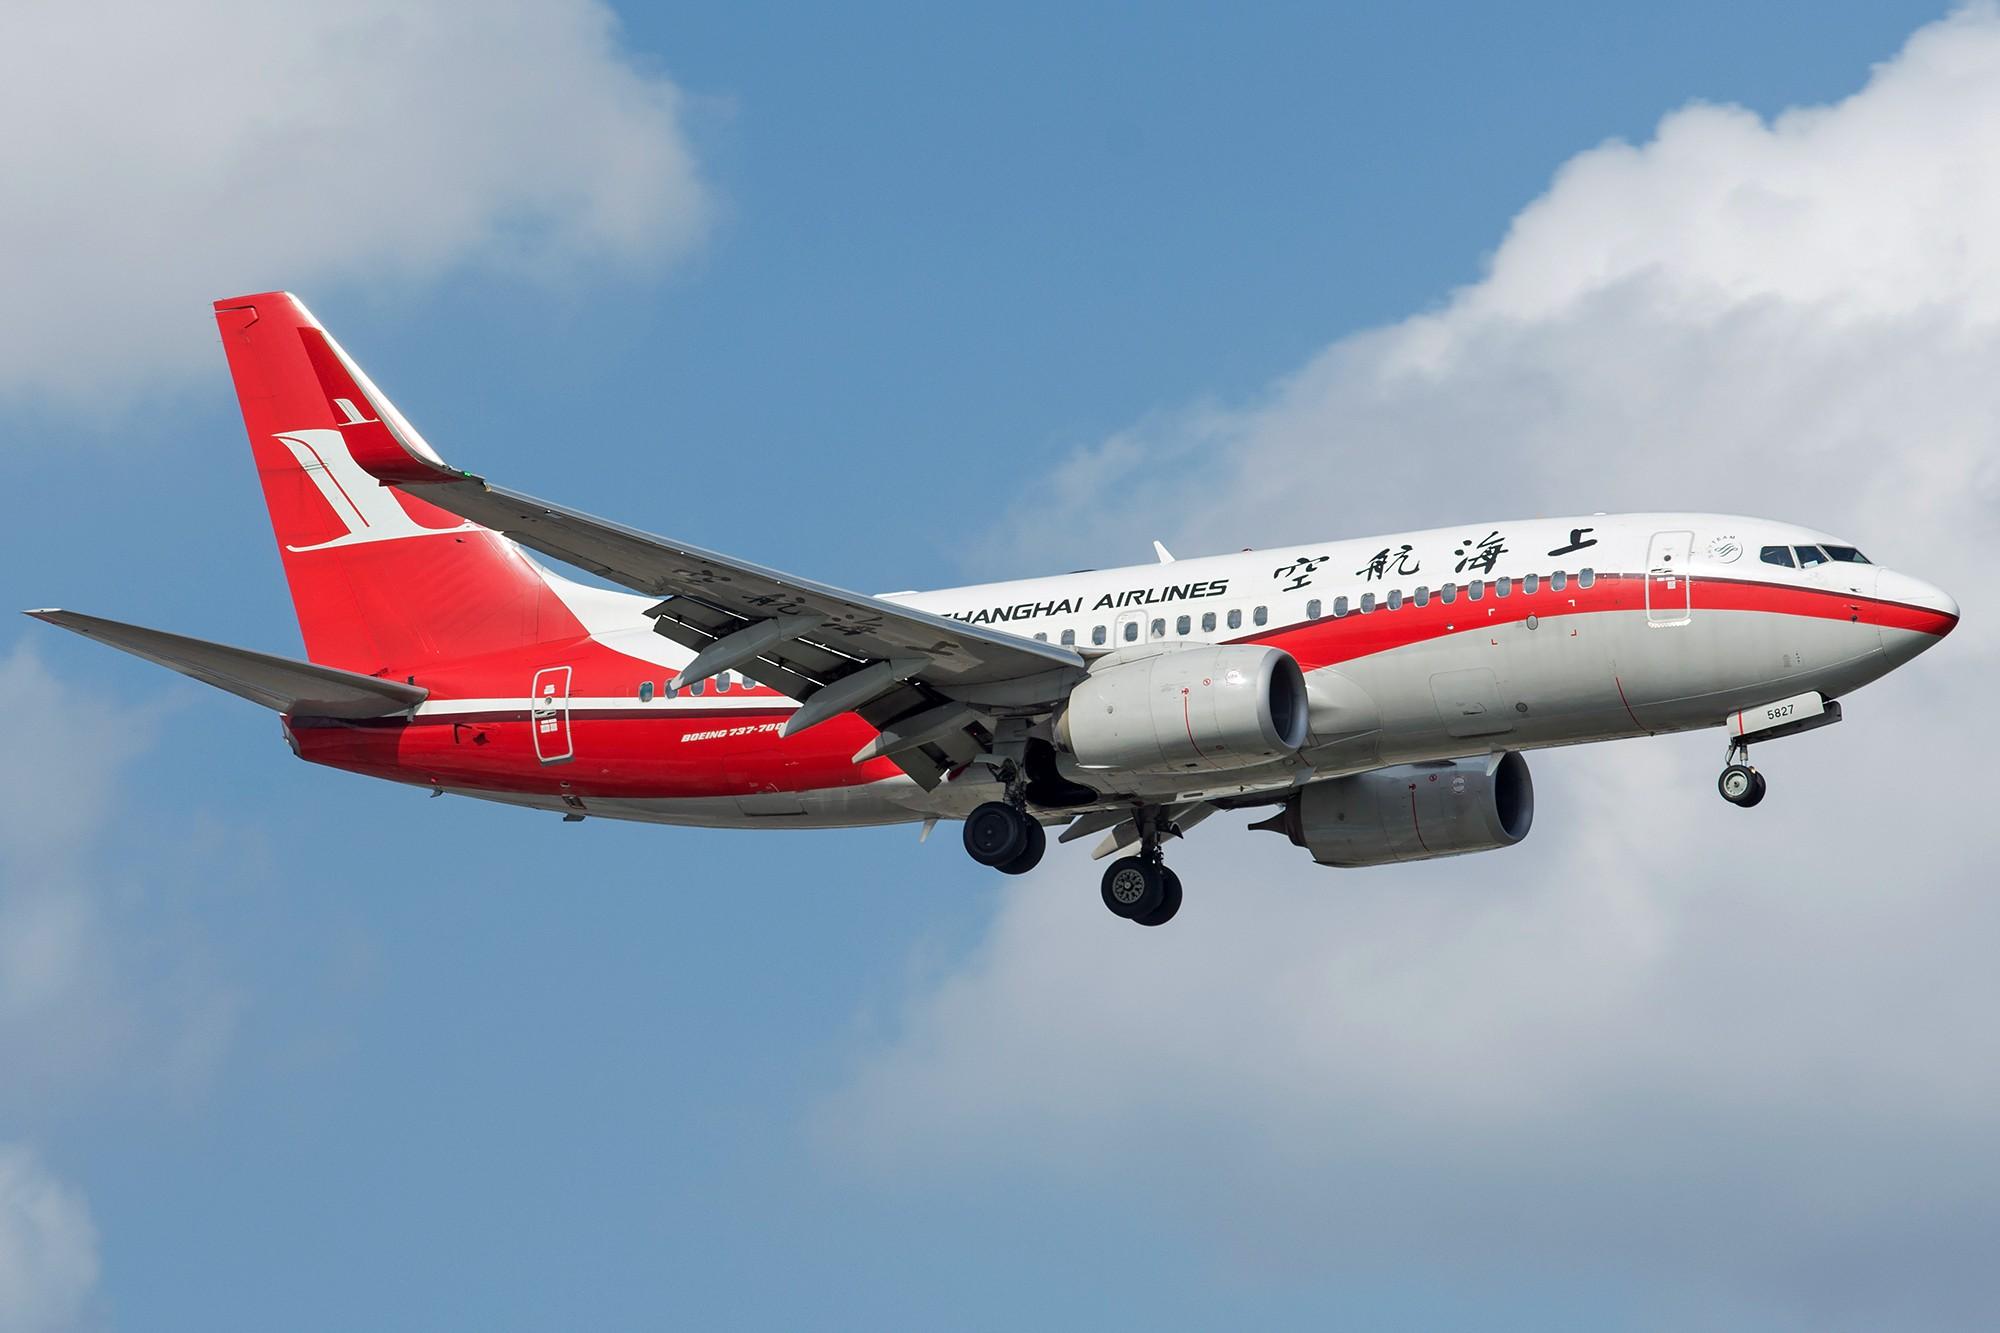 Re:[原创][SHA]蓝天白云下737一组 BOEING 737-700 B-5827 中国上海虹桥国际机场